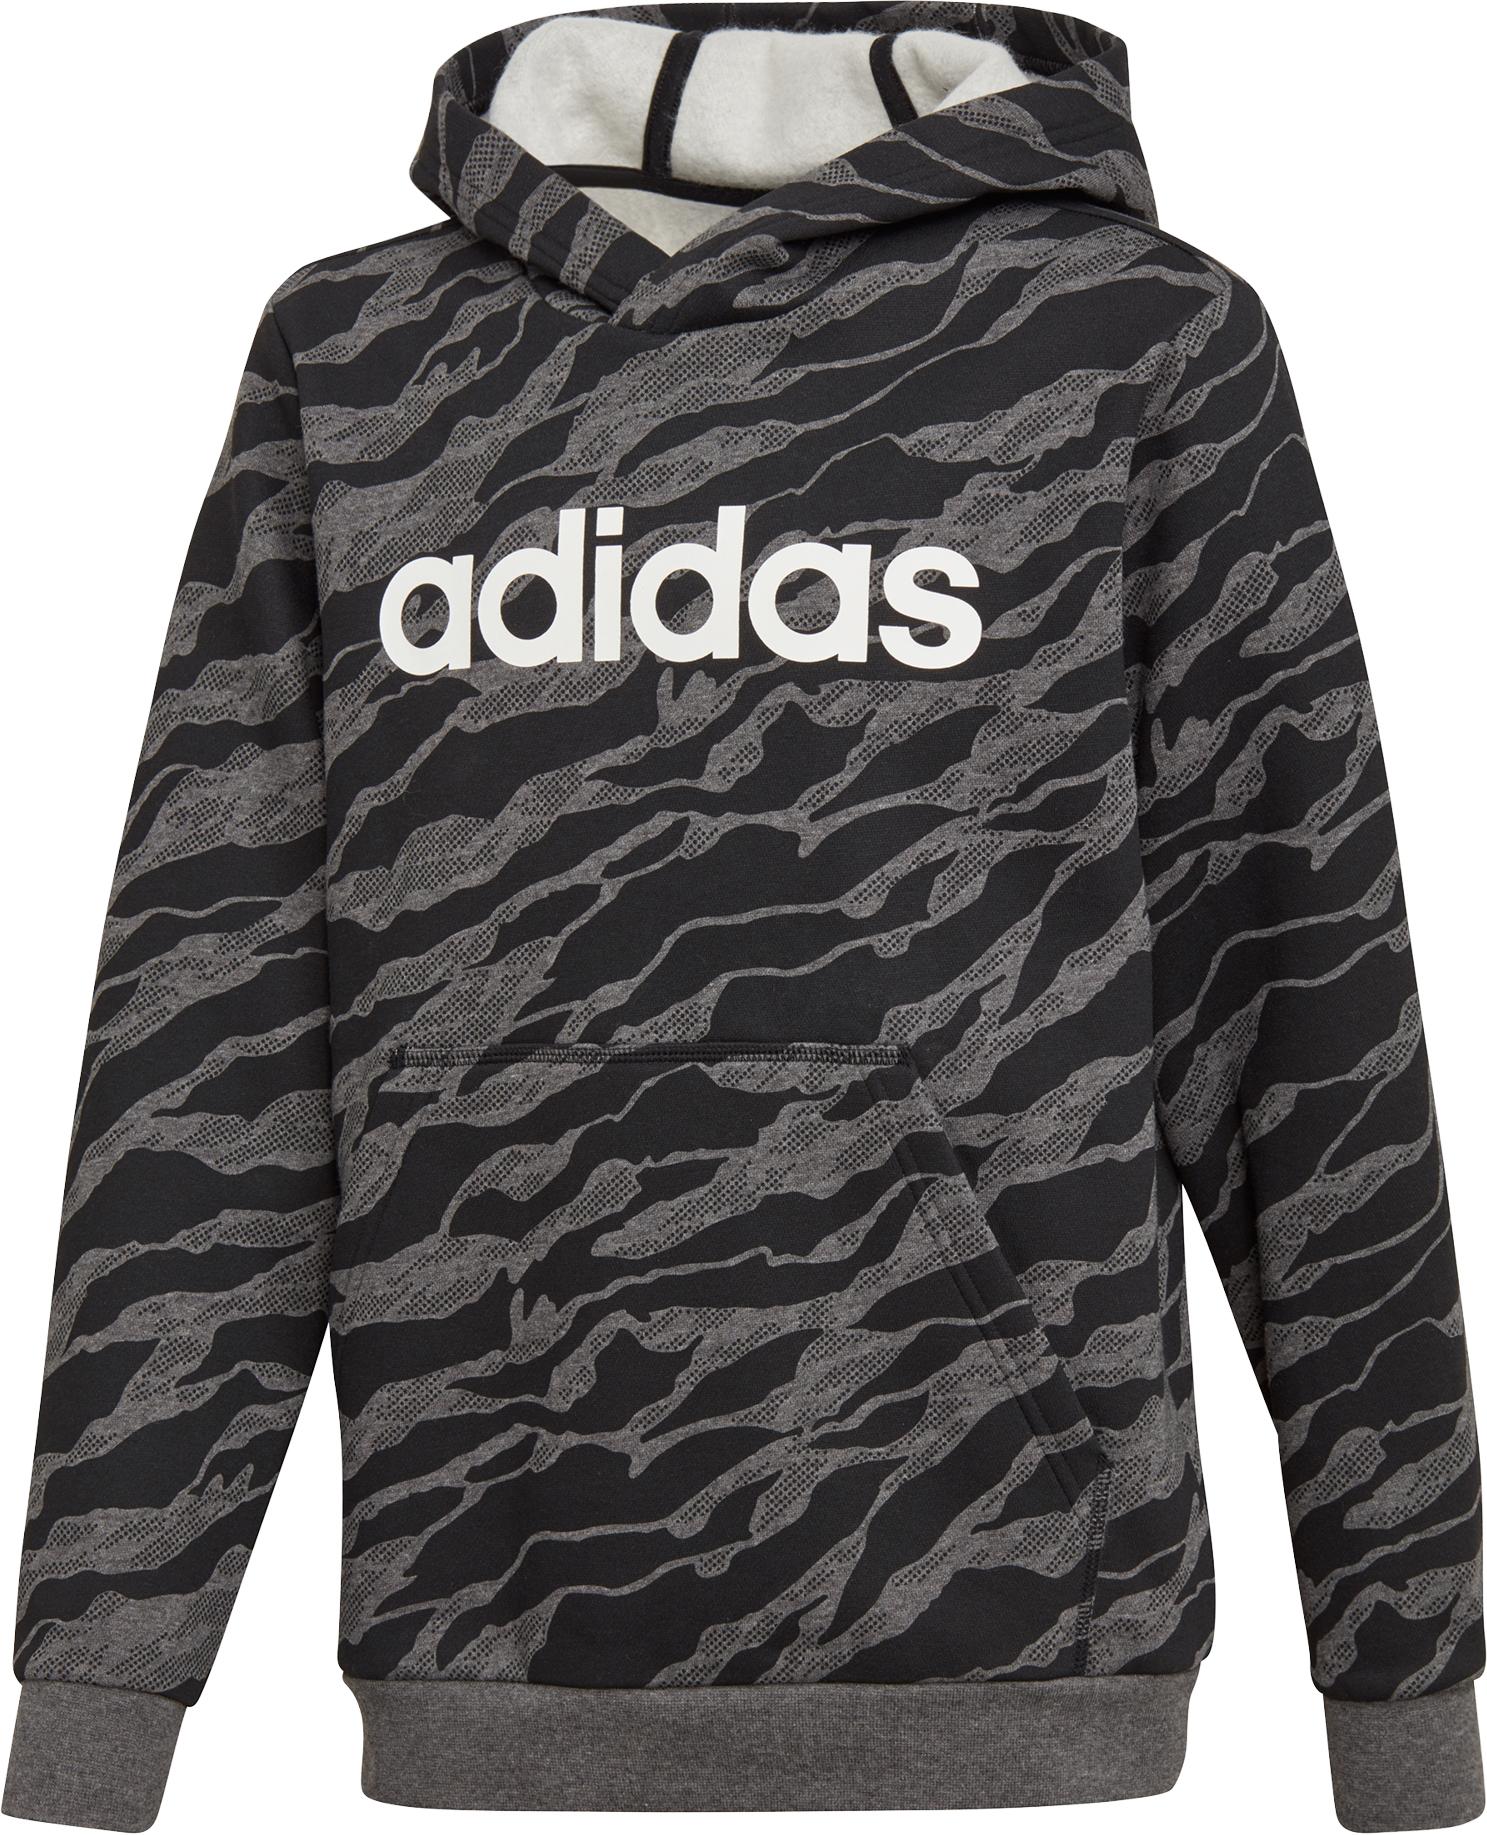 49d548bac Adidas Linear Hoodie - Boys' - Youths | MEC